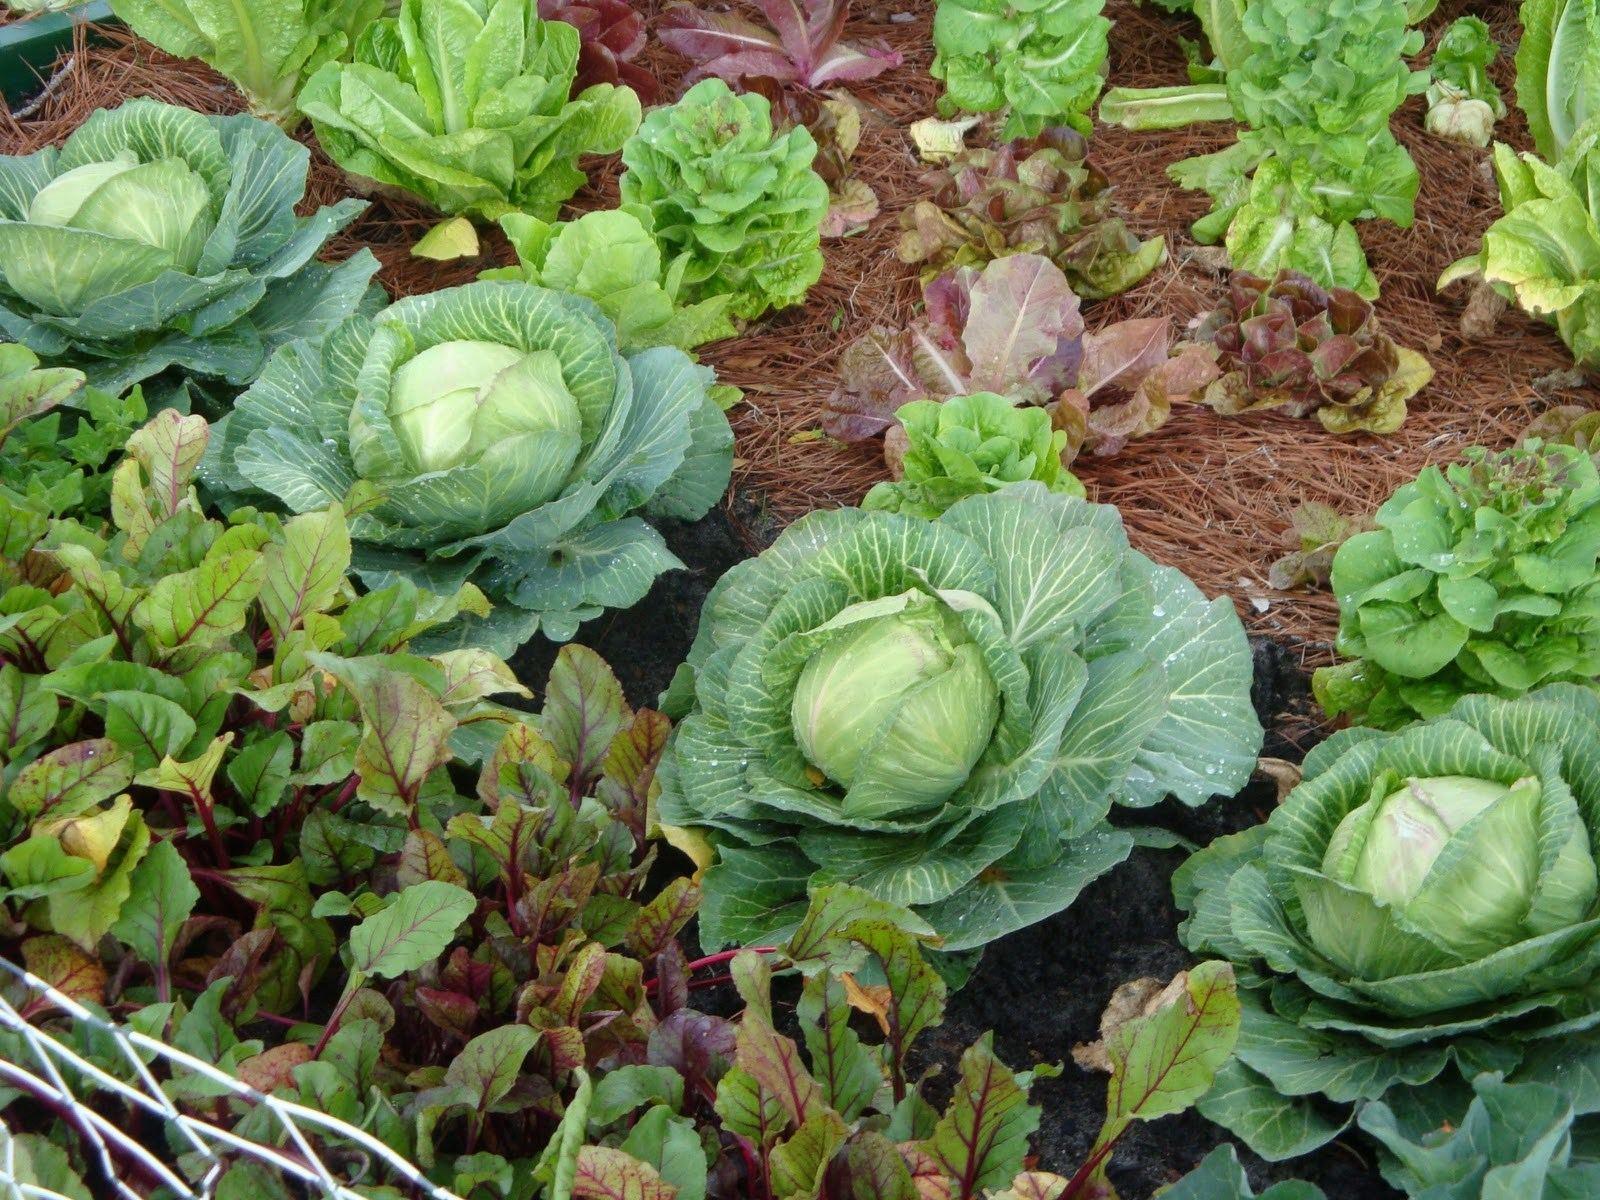 planning an urban vegetable garden photo - 4